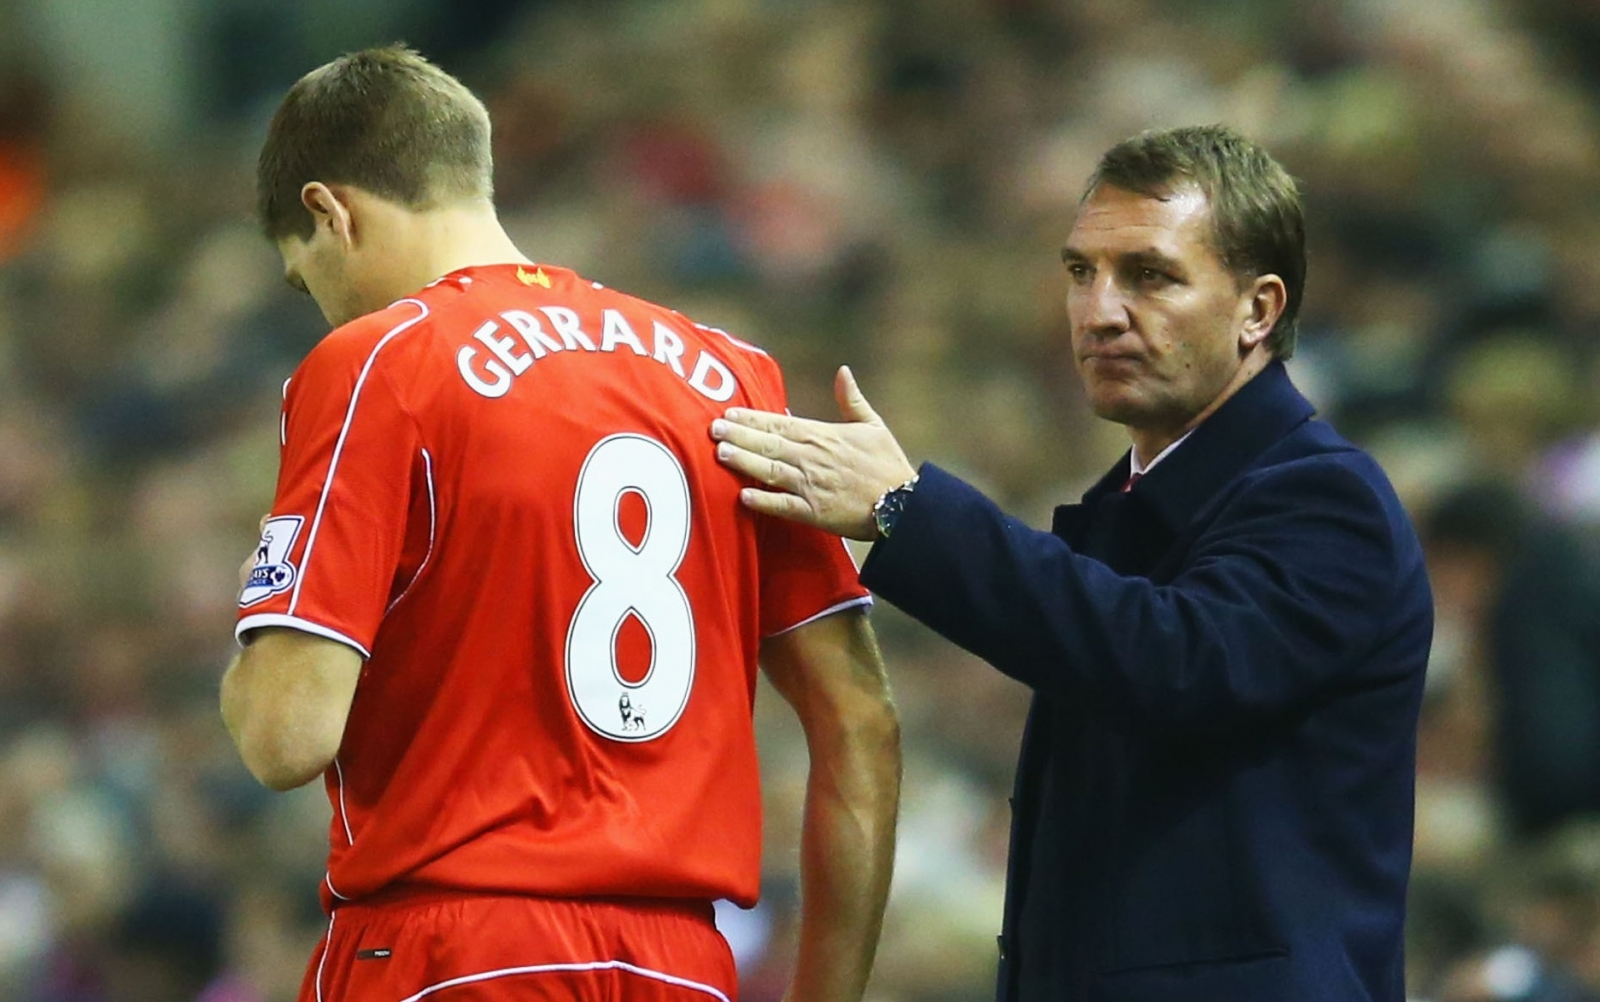 Steven Gerrard and Brendan Rodgers